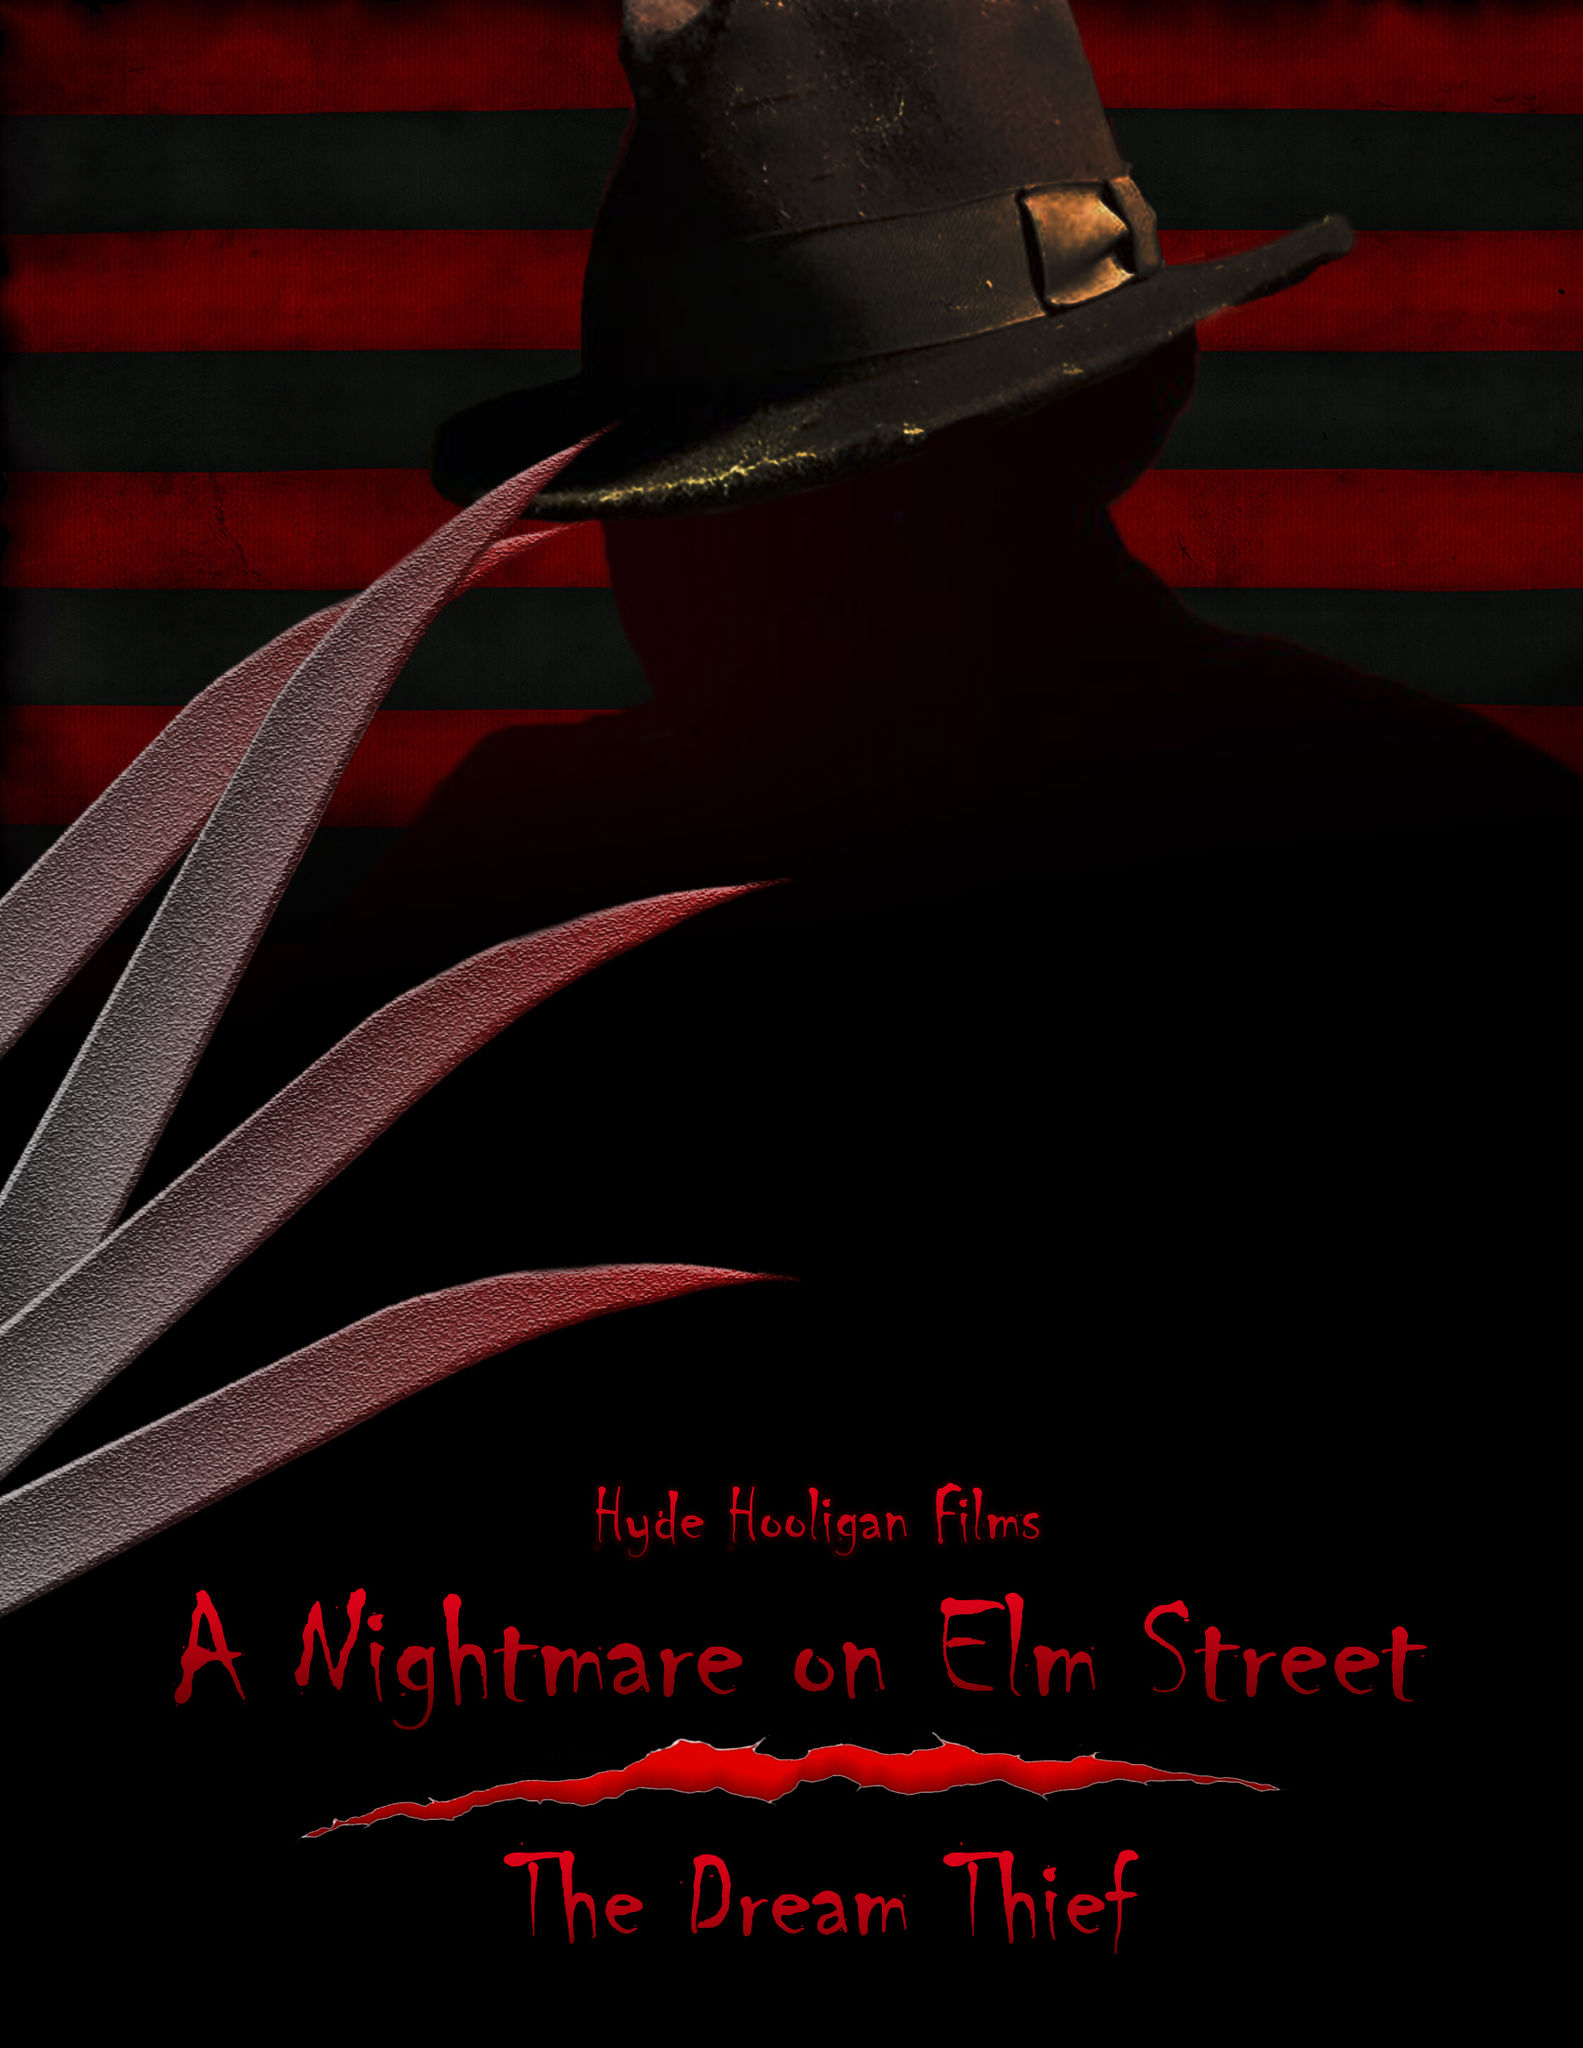 A NIGHTMARE ON ELM STREET: THE DREAM THIEF